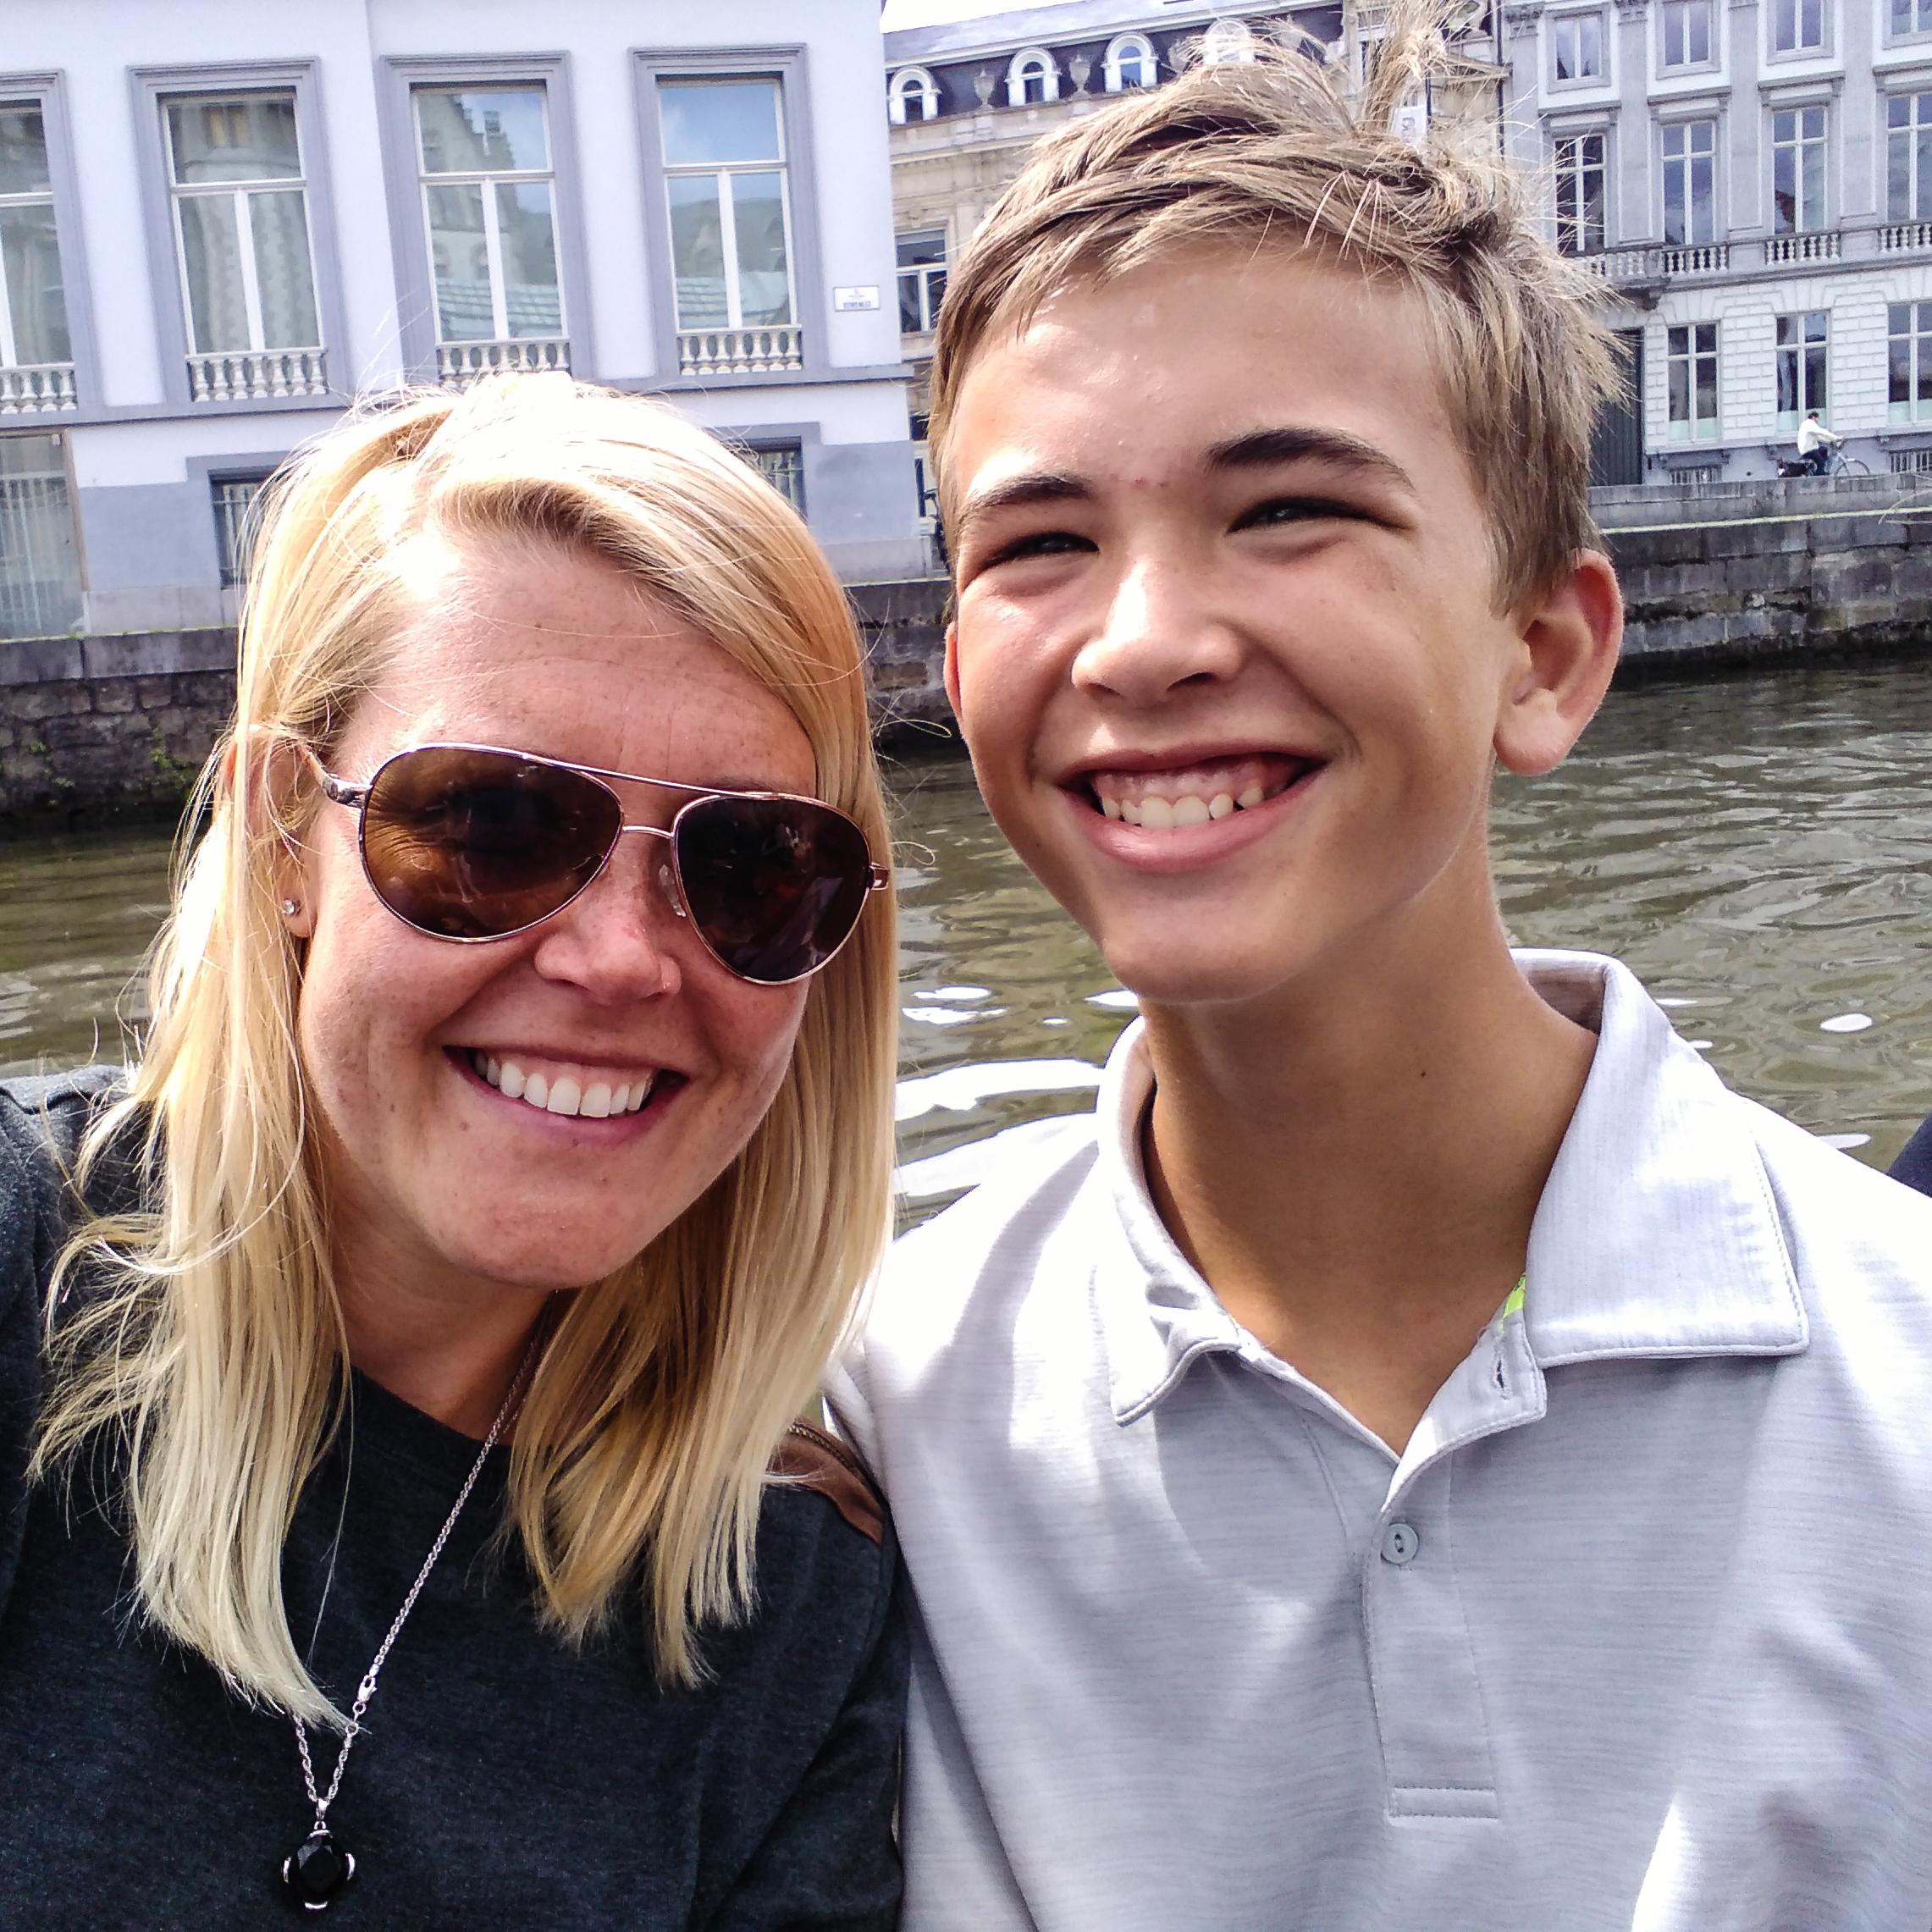 family  , travel, travel adventures, Europe, euro vacation, nephew, aunt, Gent, Belgium